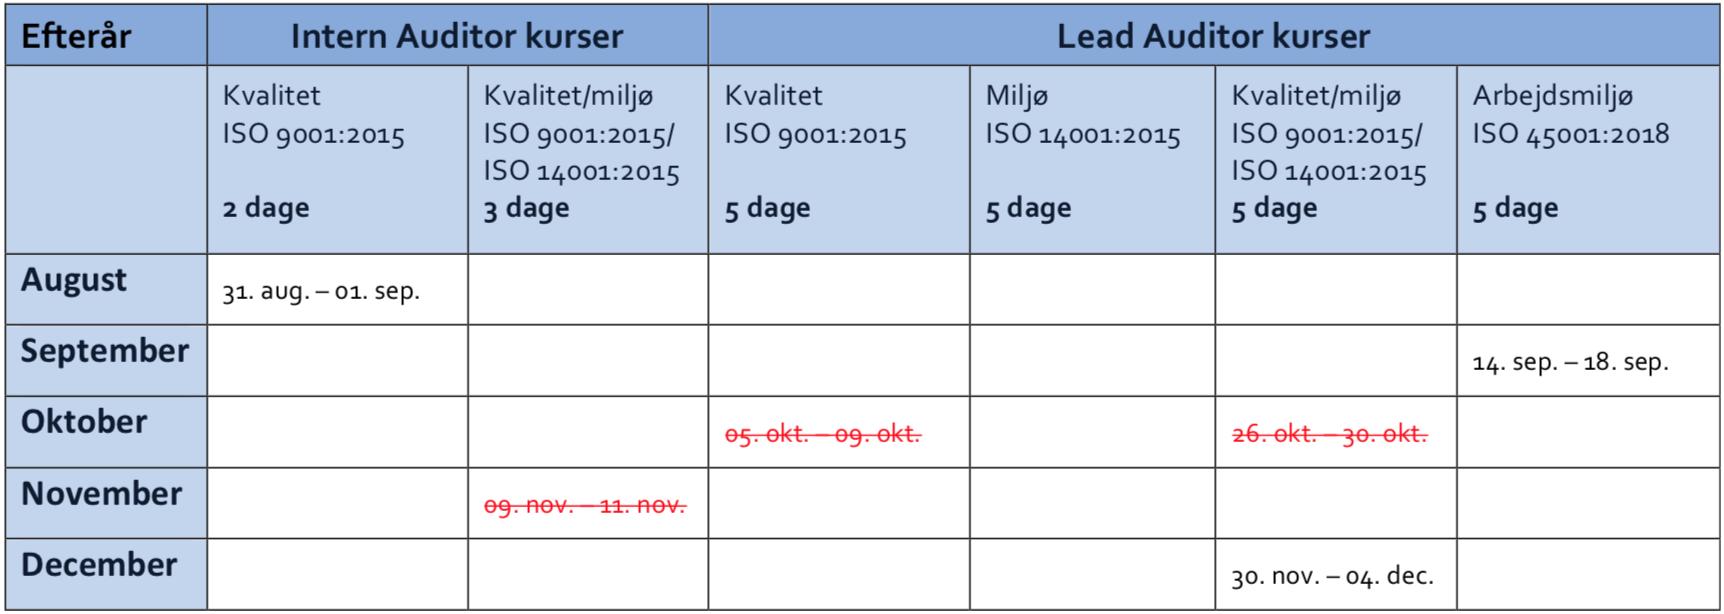 ISO kurser efterår 2020